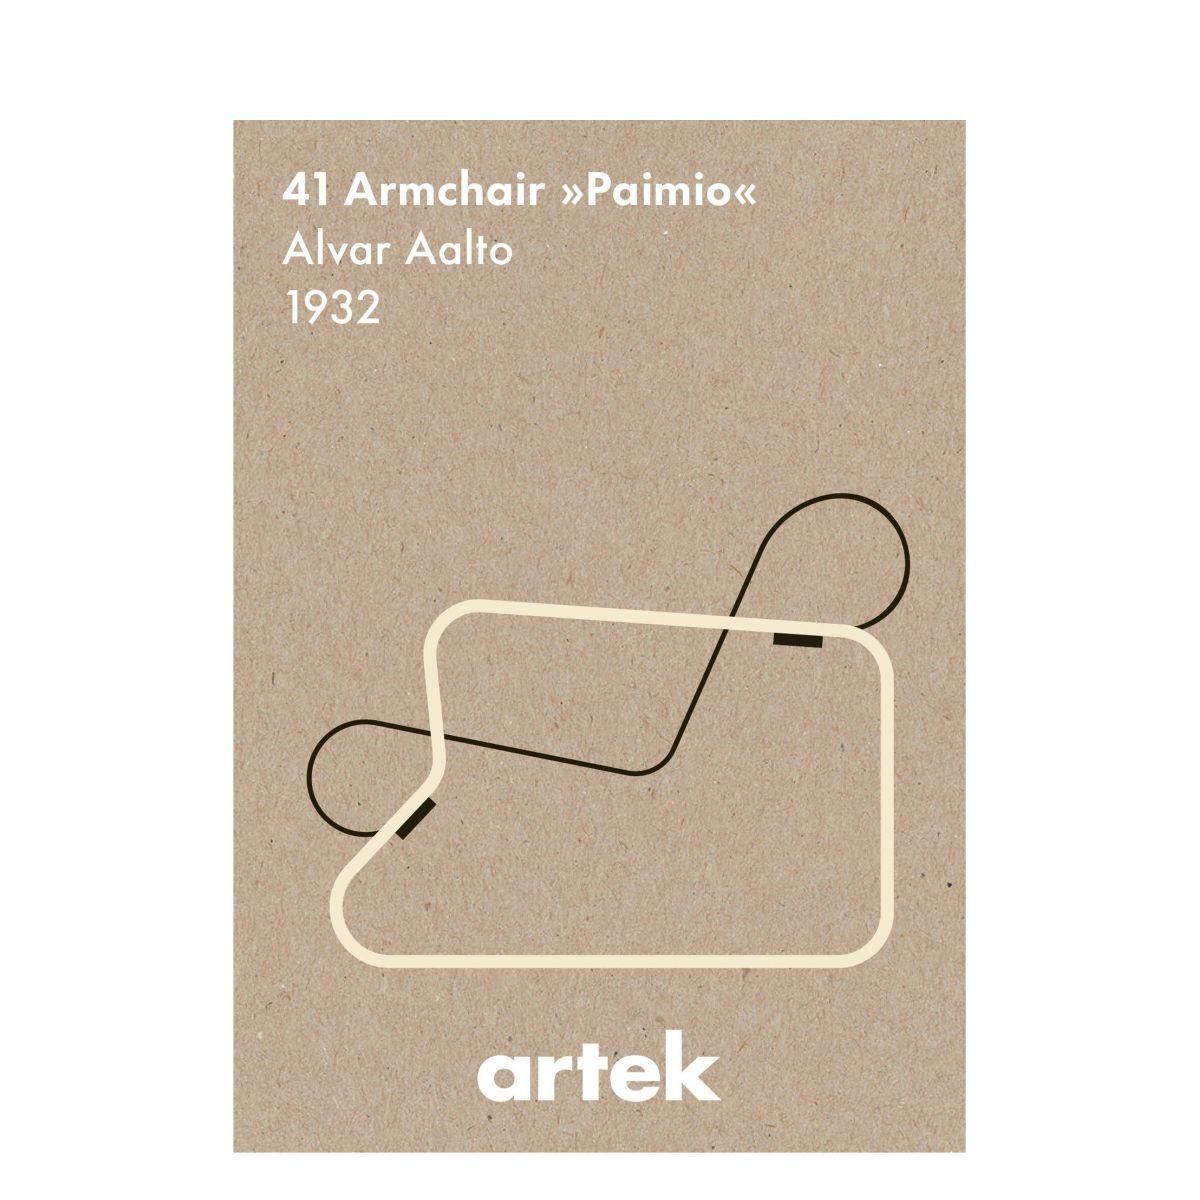 Artek-Icons-Greige-Armchair-41-Paimio_Web-1977558